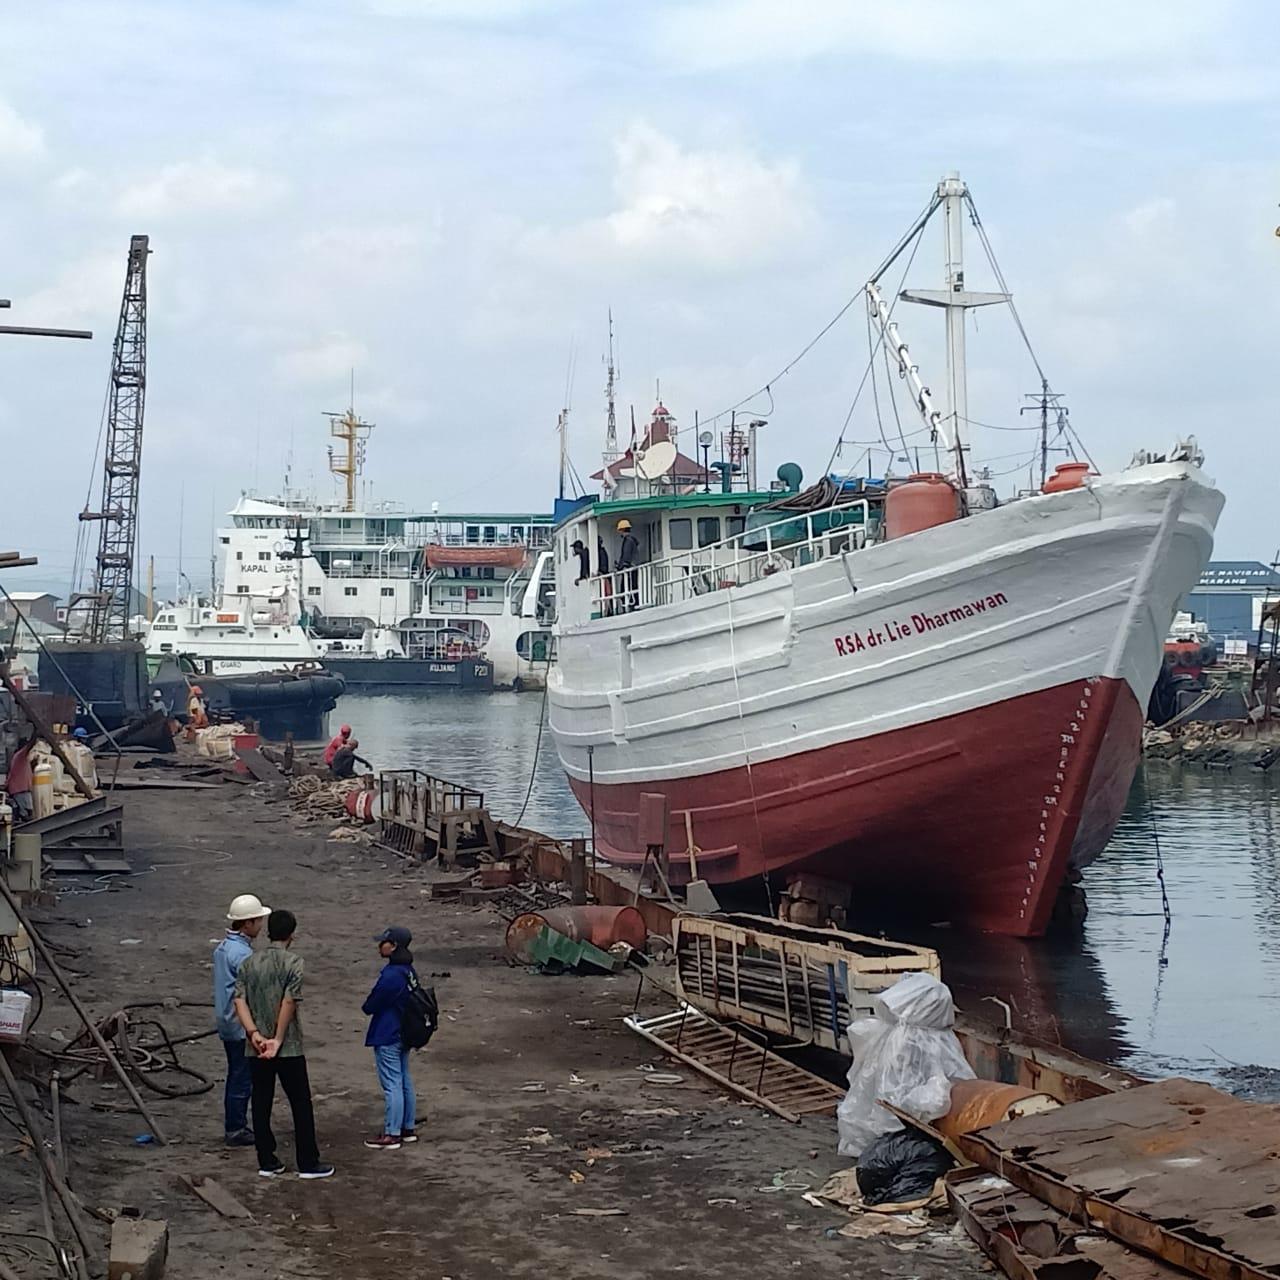 RSA dr Lie Dharmawan Docking Di Galangan Samudera Indonesia